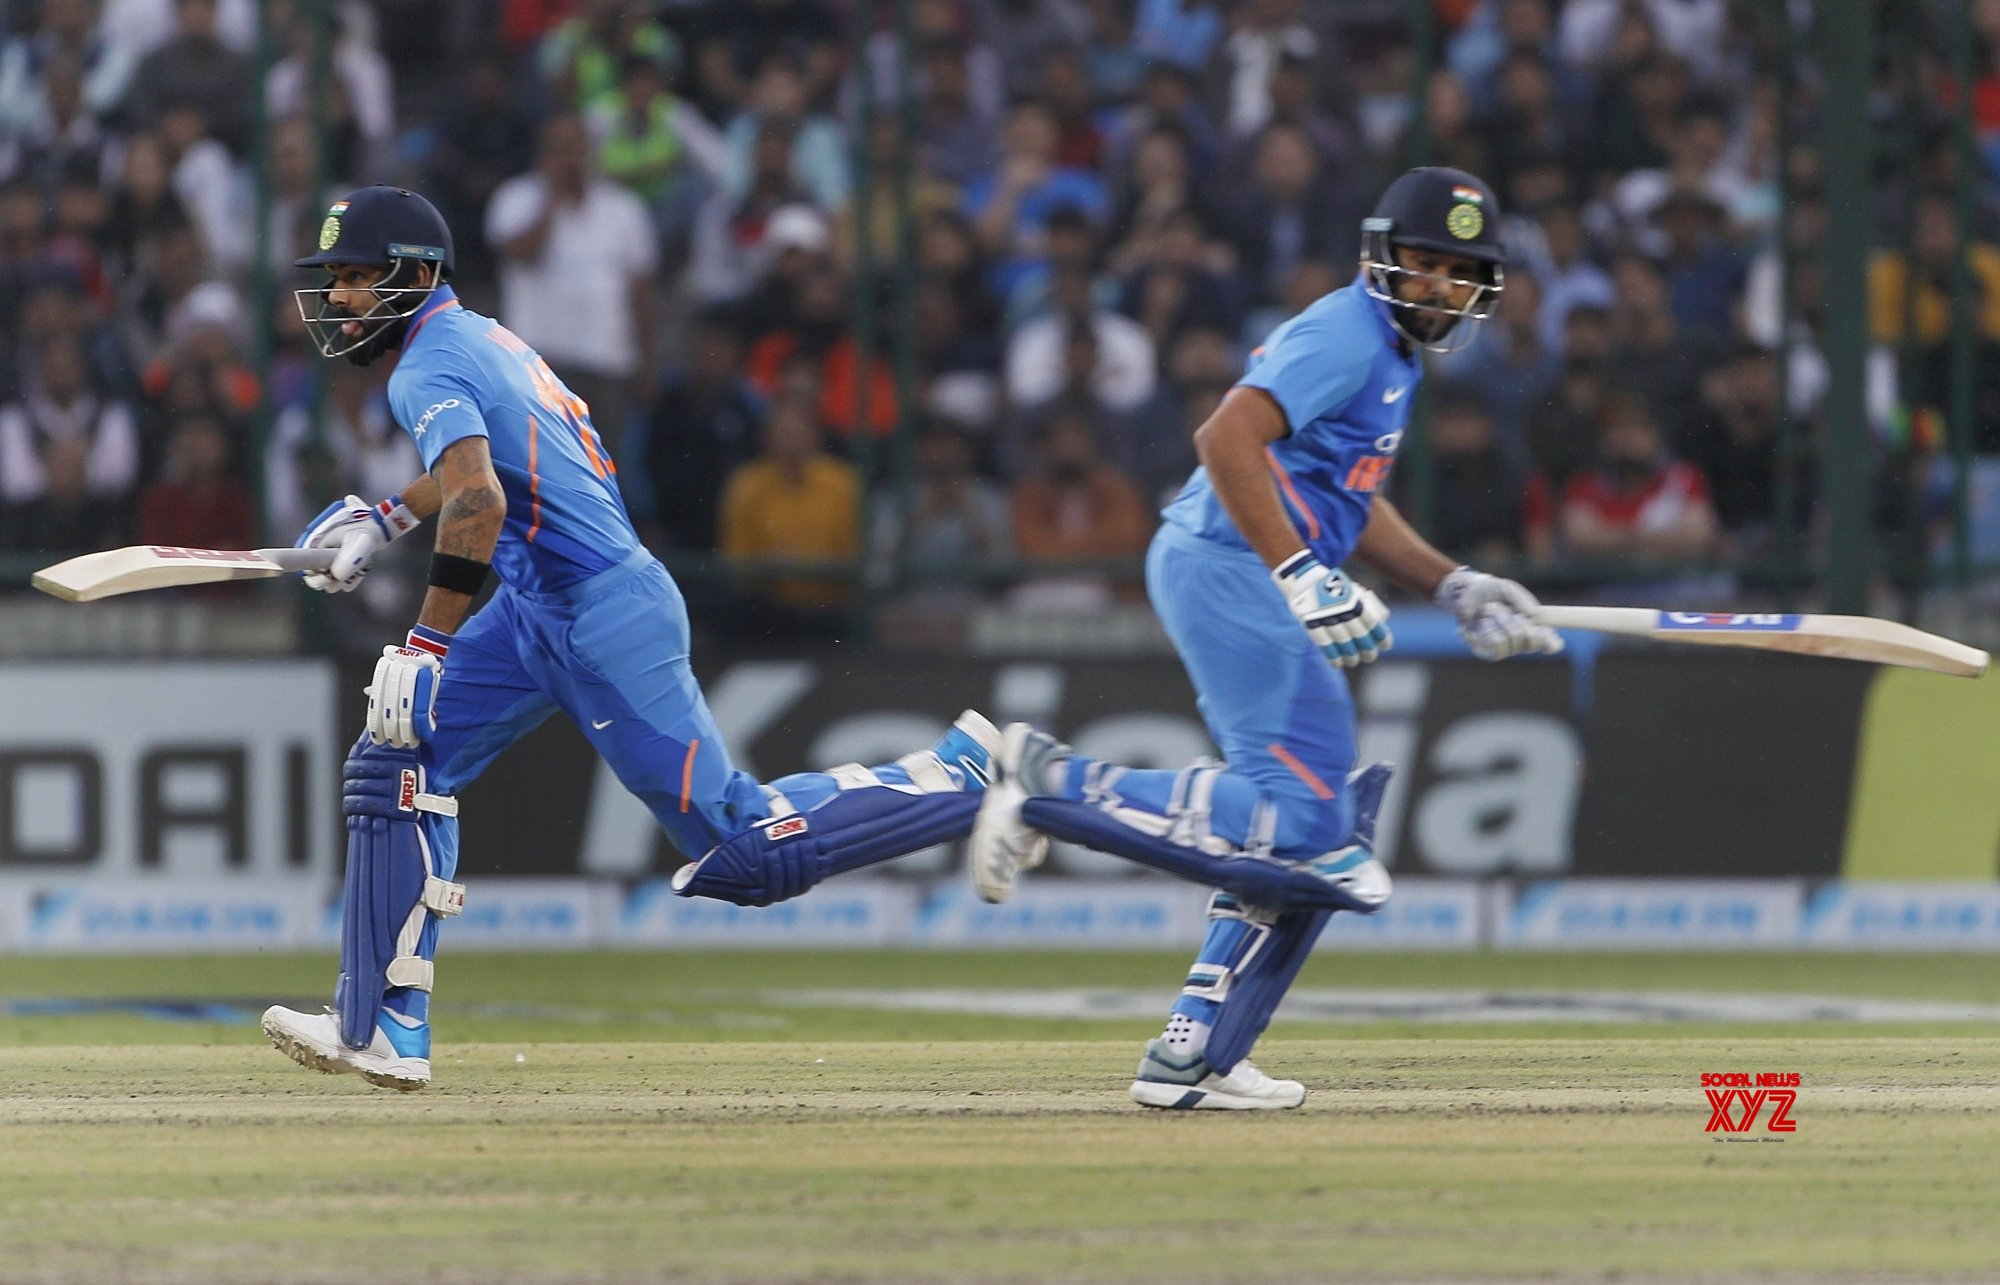 ICC ODI Rankings: Kohli, Rohit dominate top slots